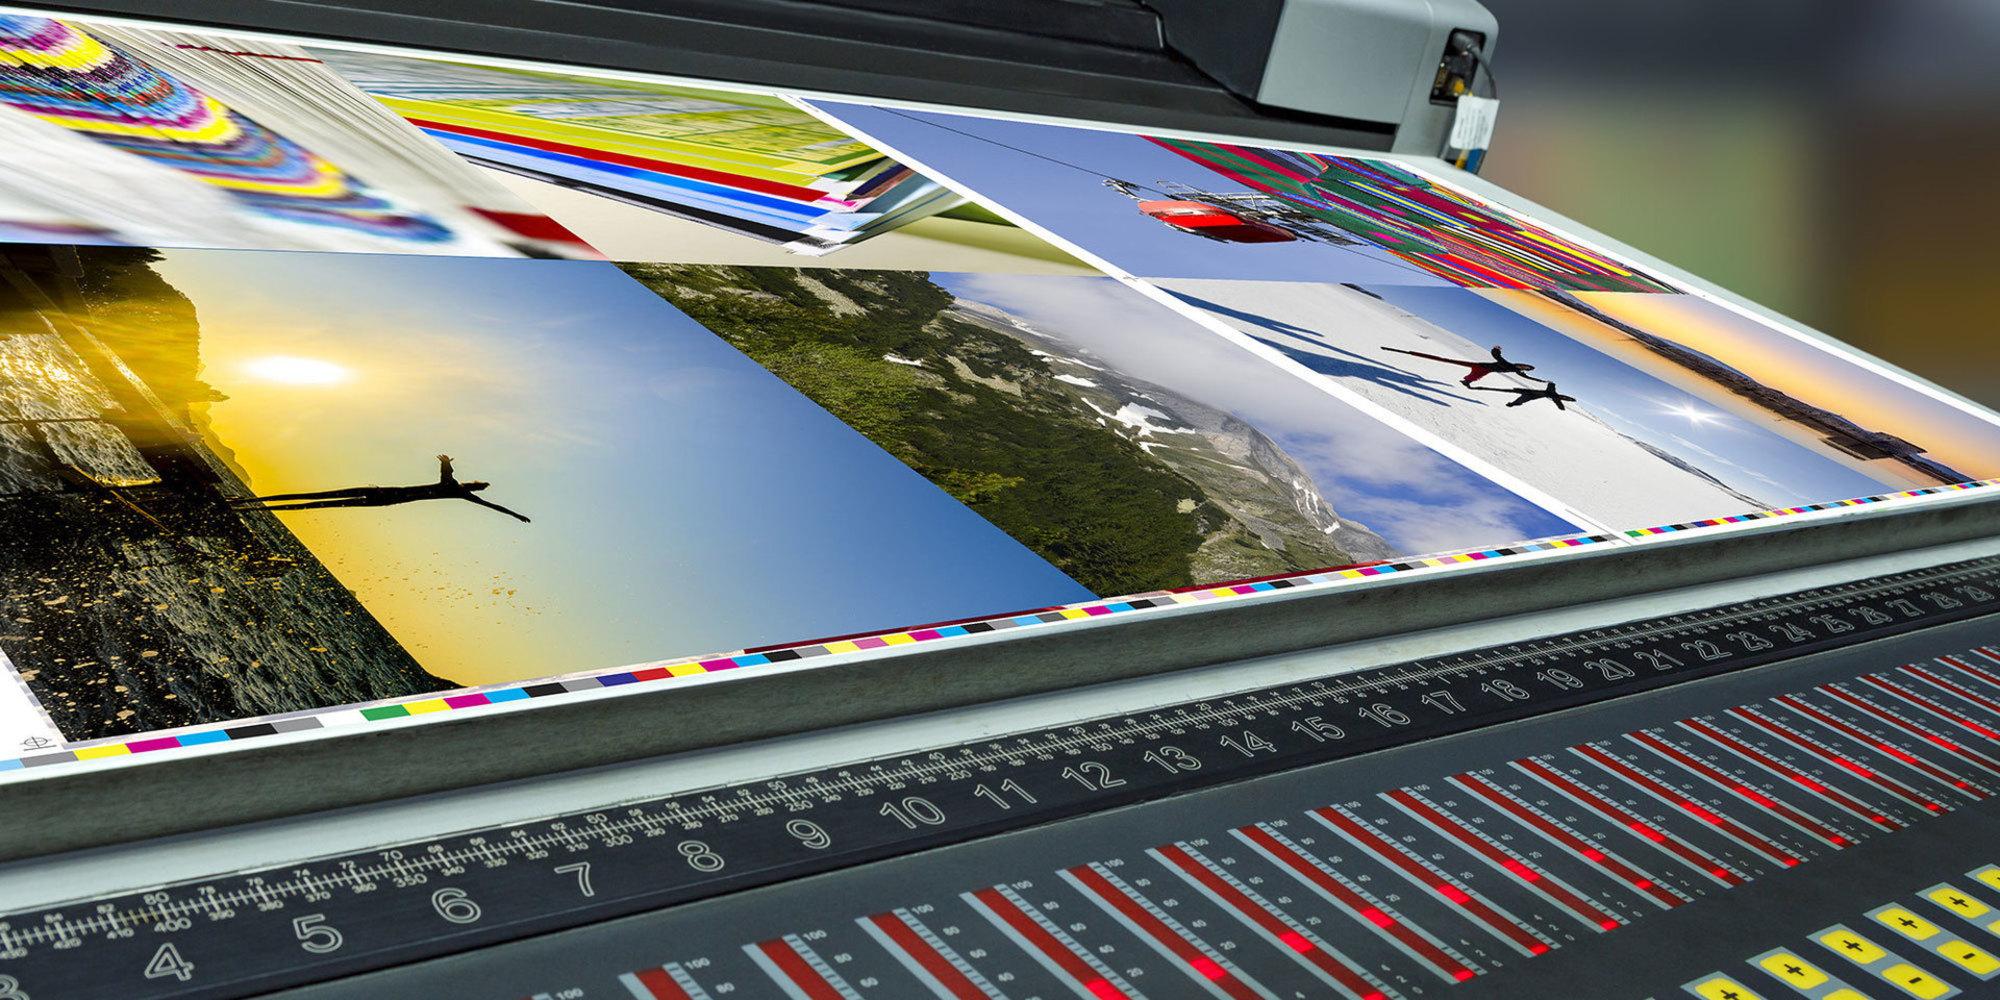 Artemis – The image makers - Imprimeur